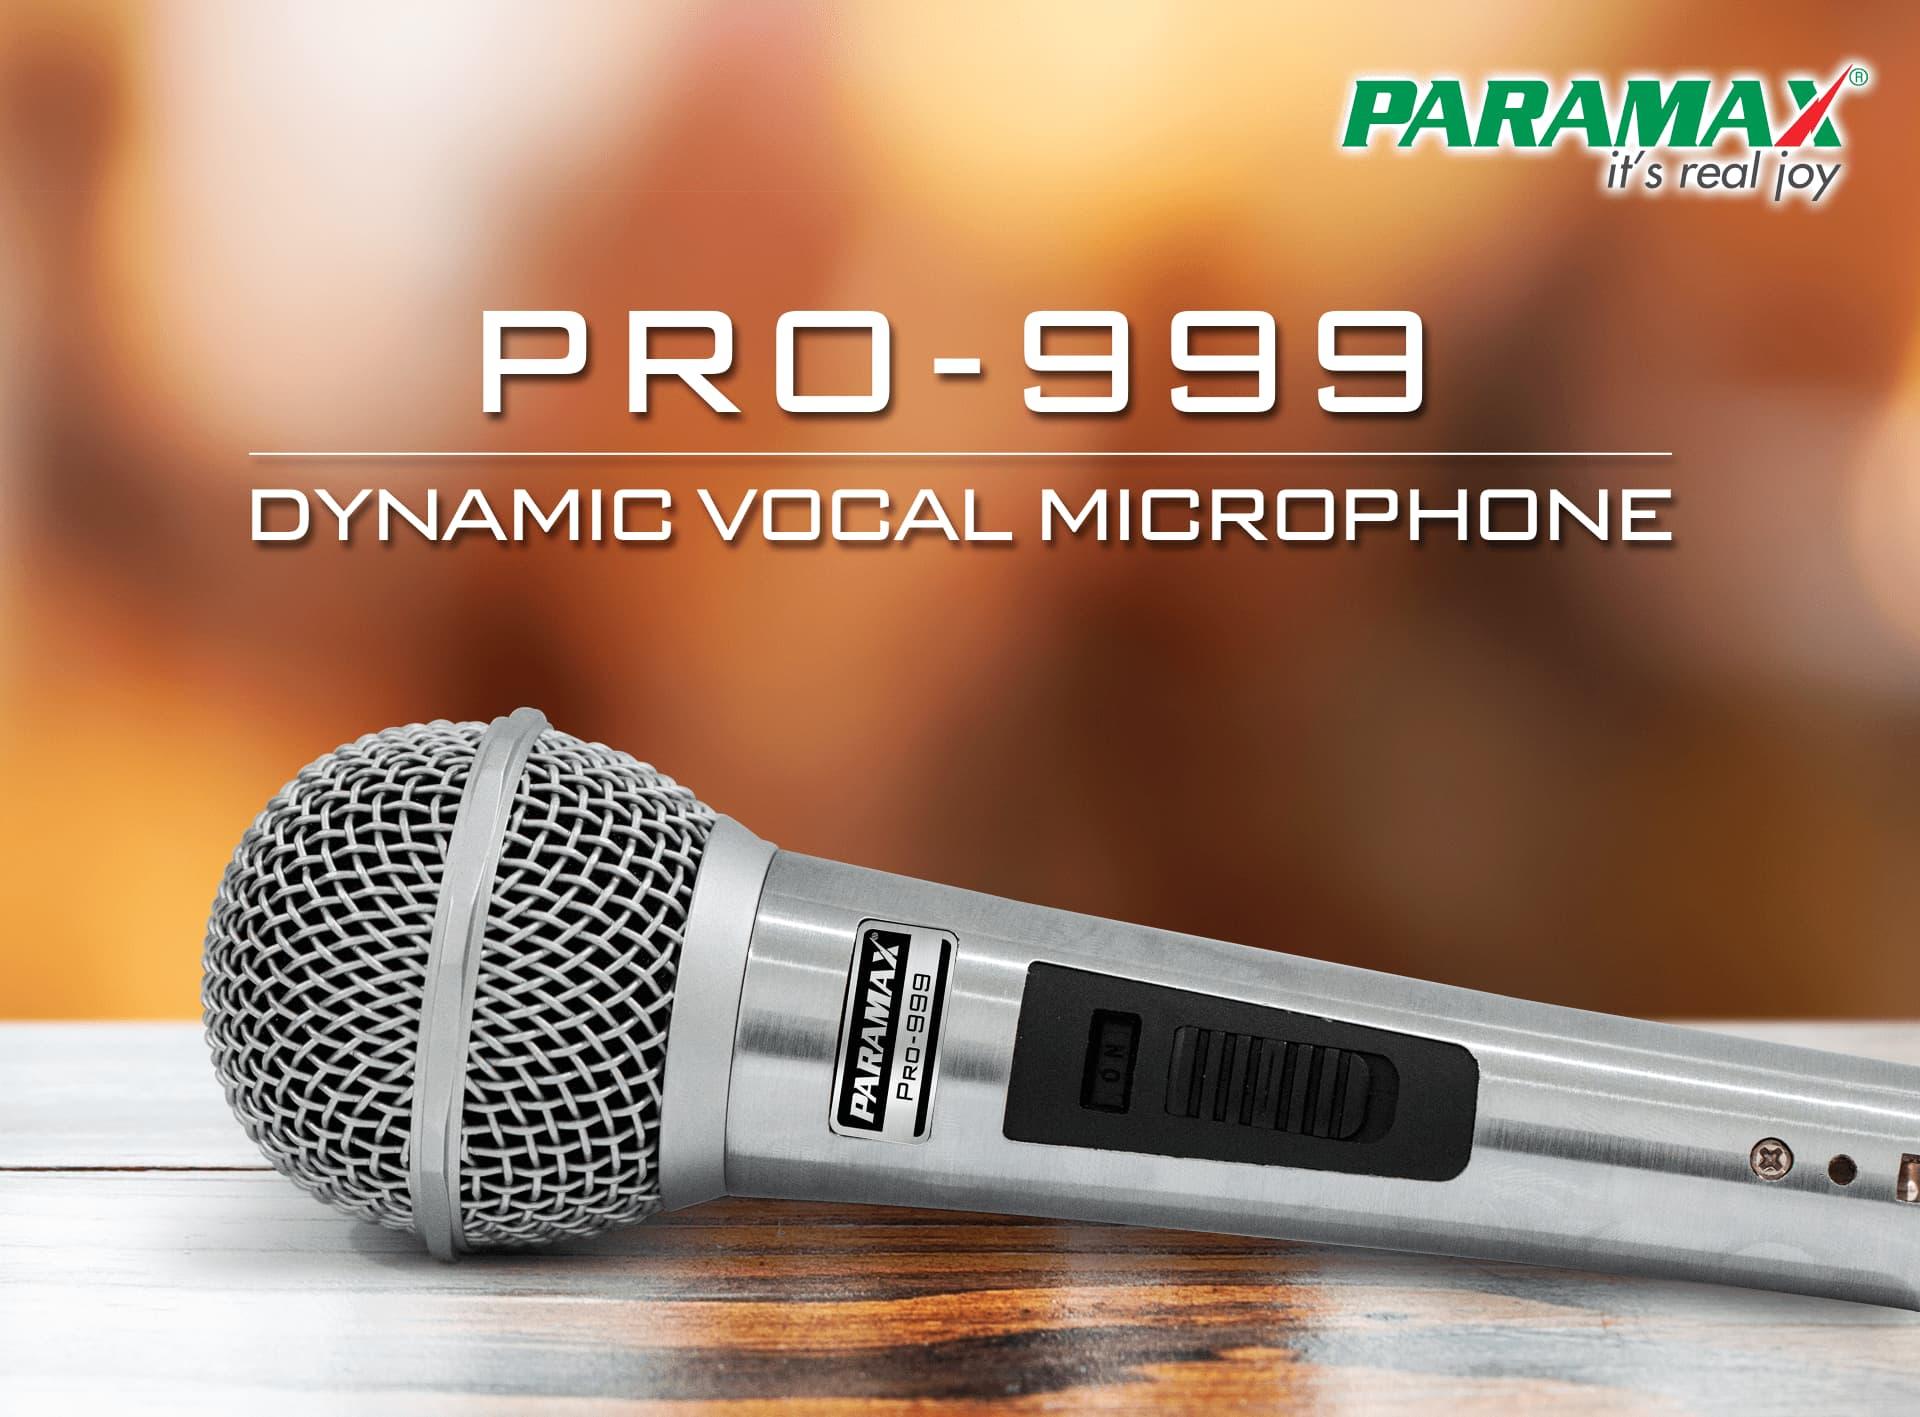 Micro Paramax pro-999